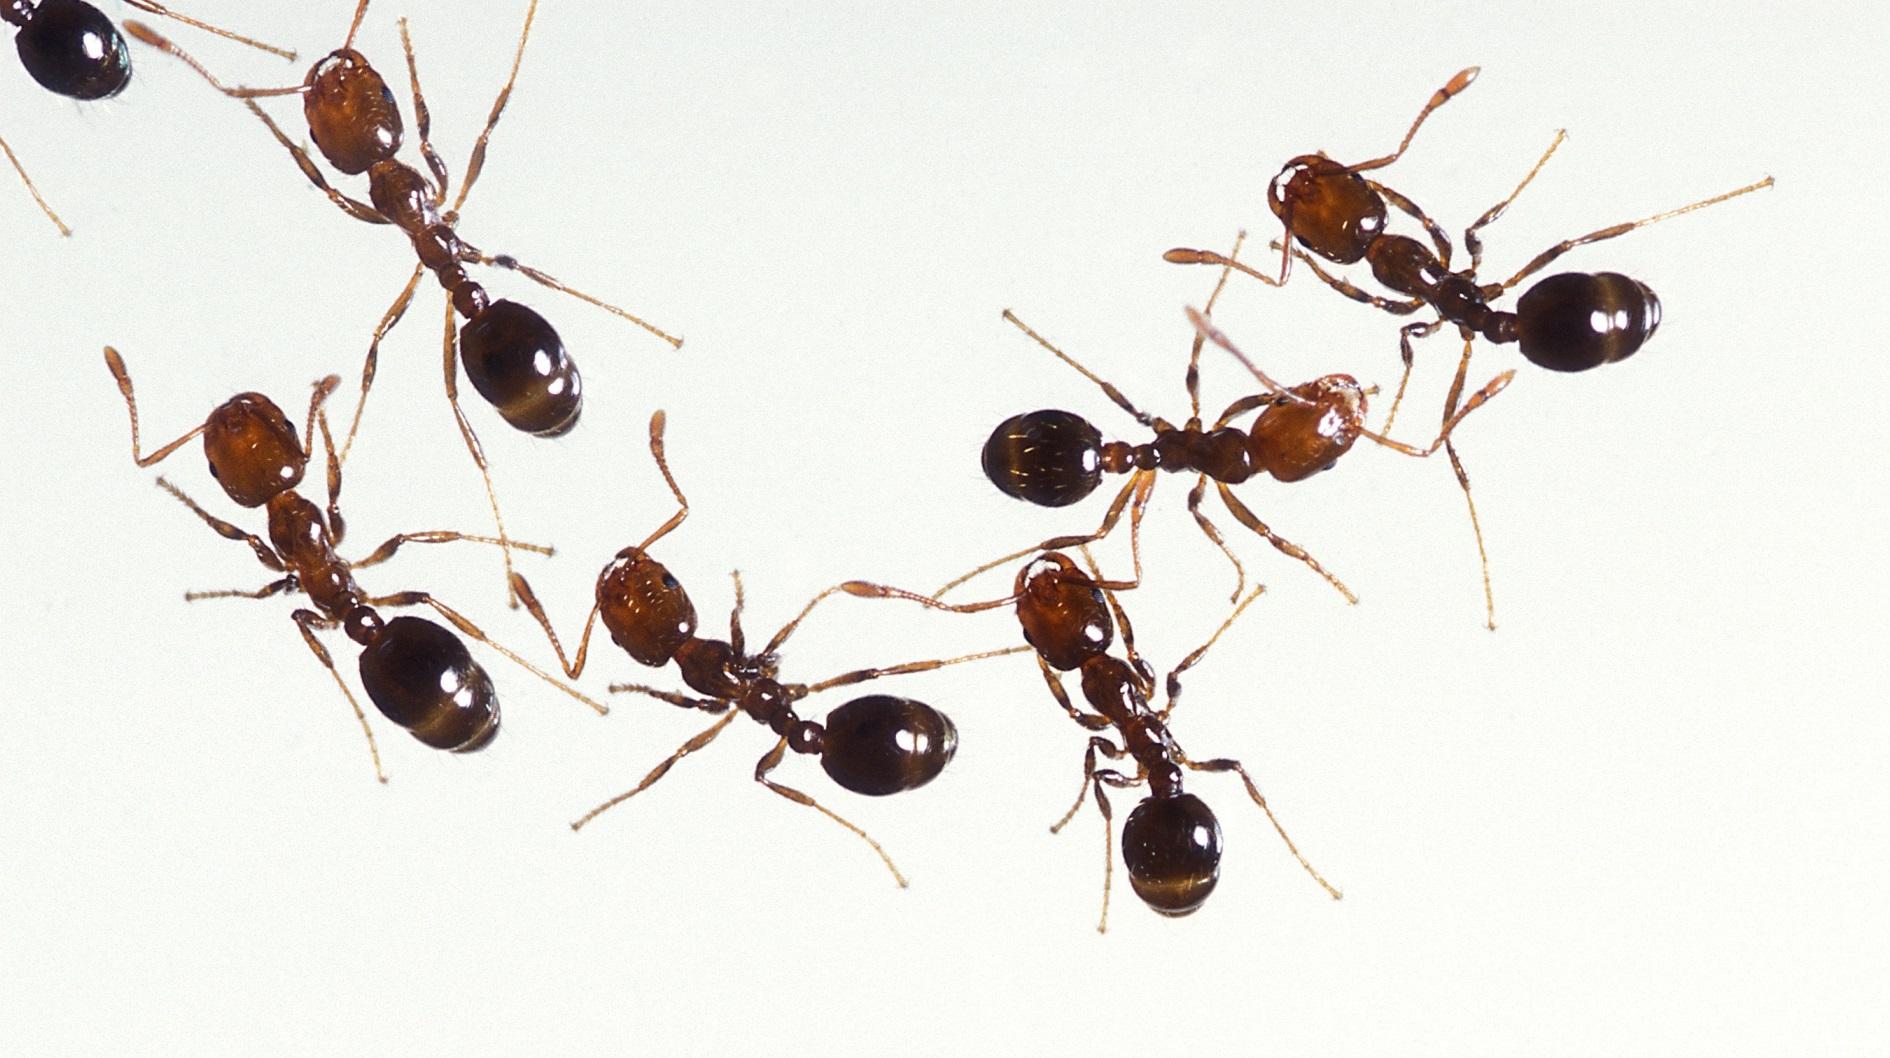 Formigas lava pés